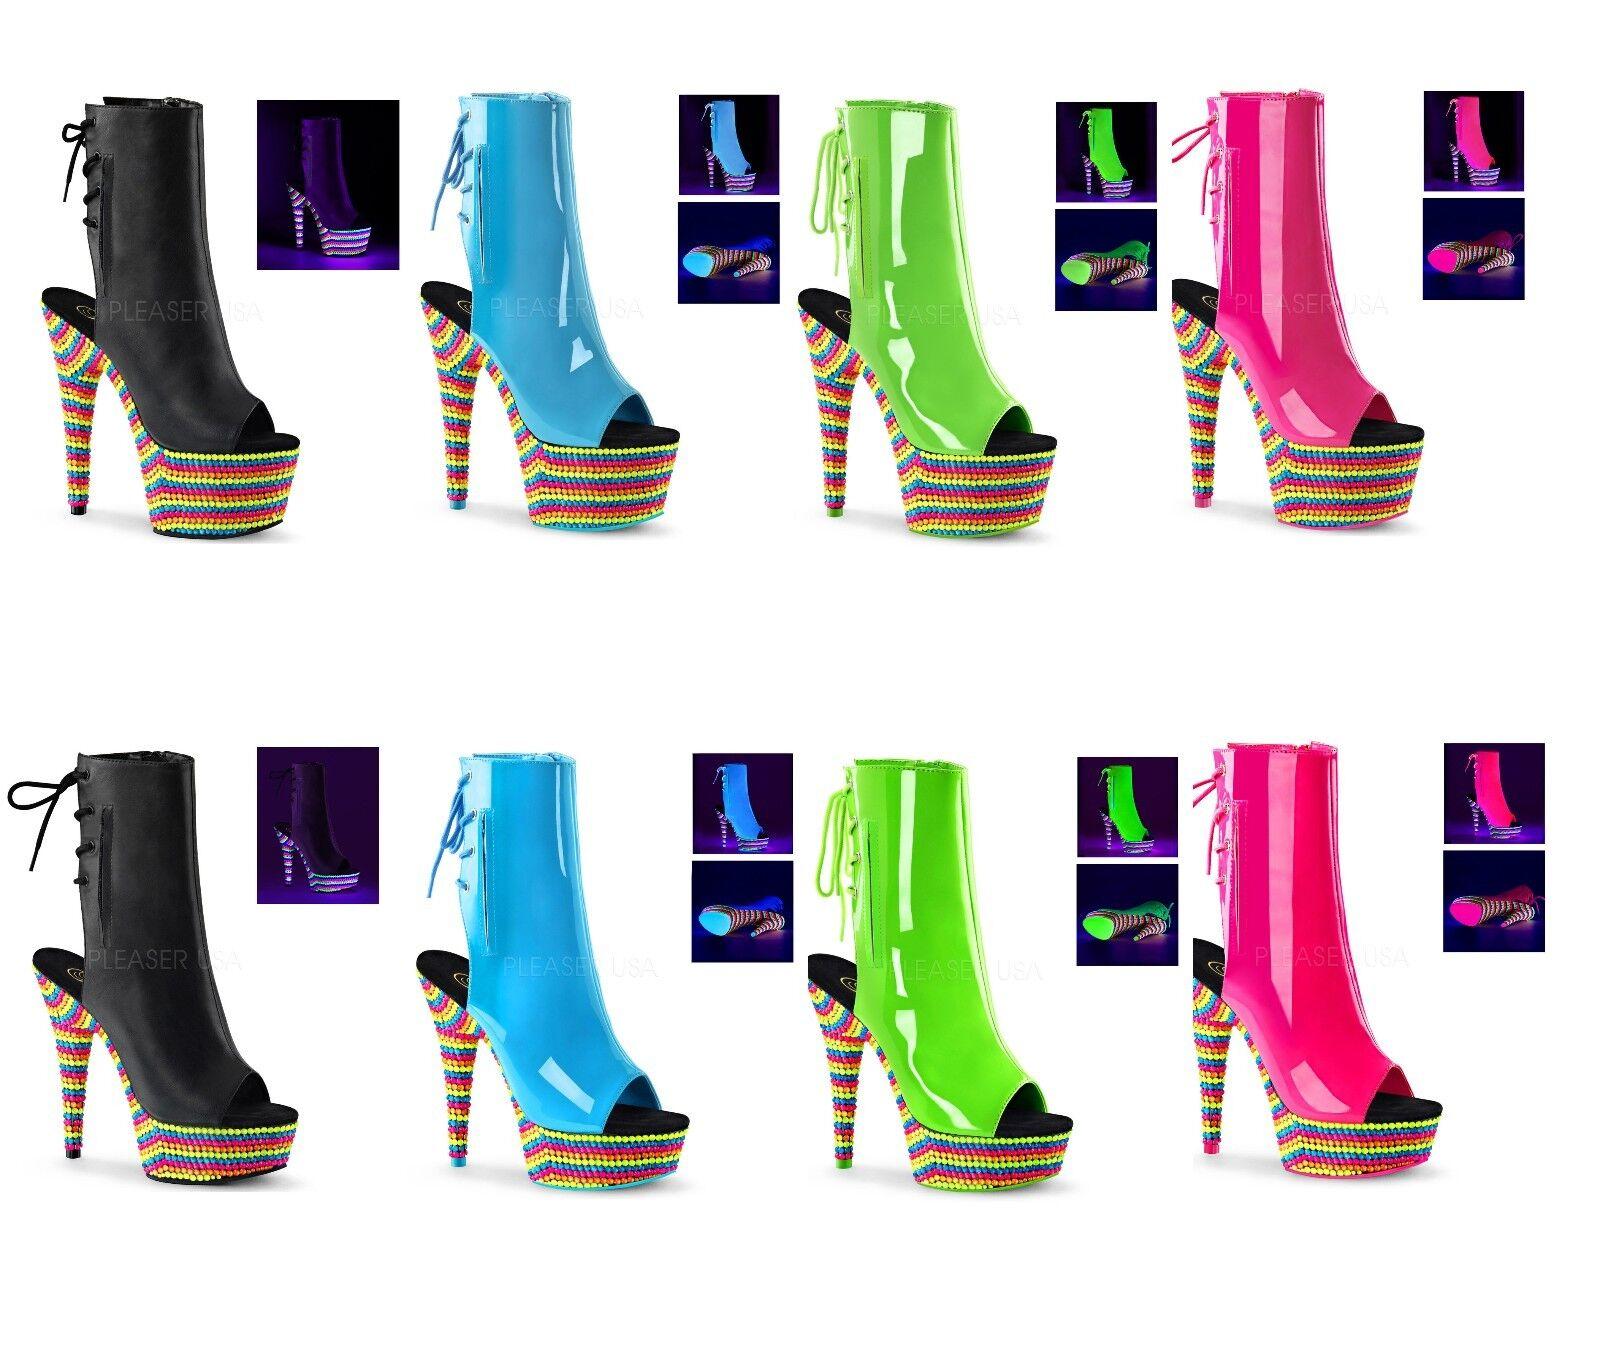 PLEASER ADORE DELIGHT 1018RBS Exotic Dancing Platform boots UV Reactive Stone